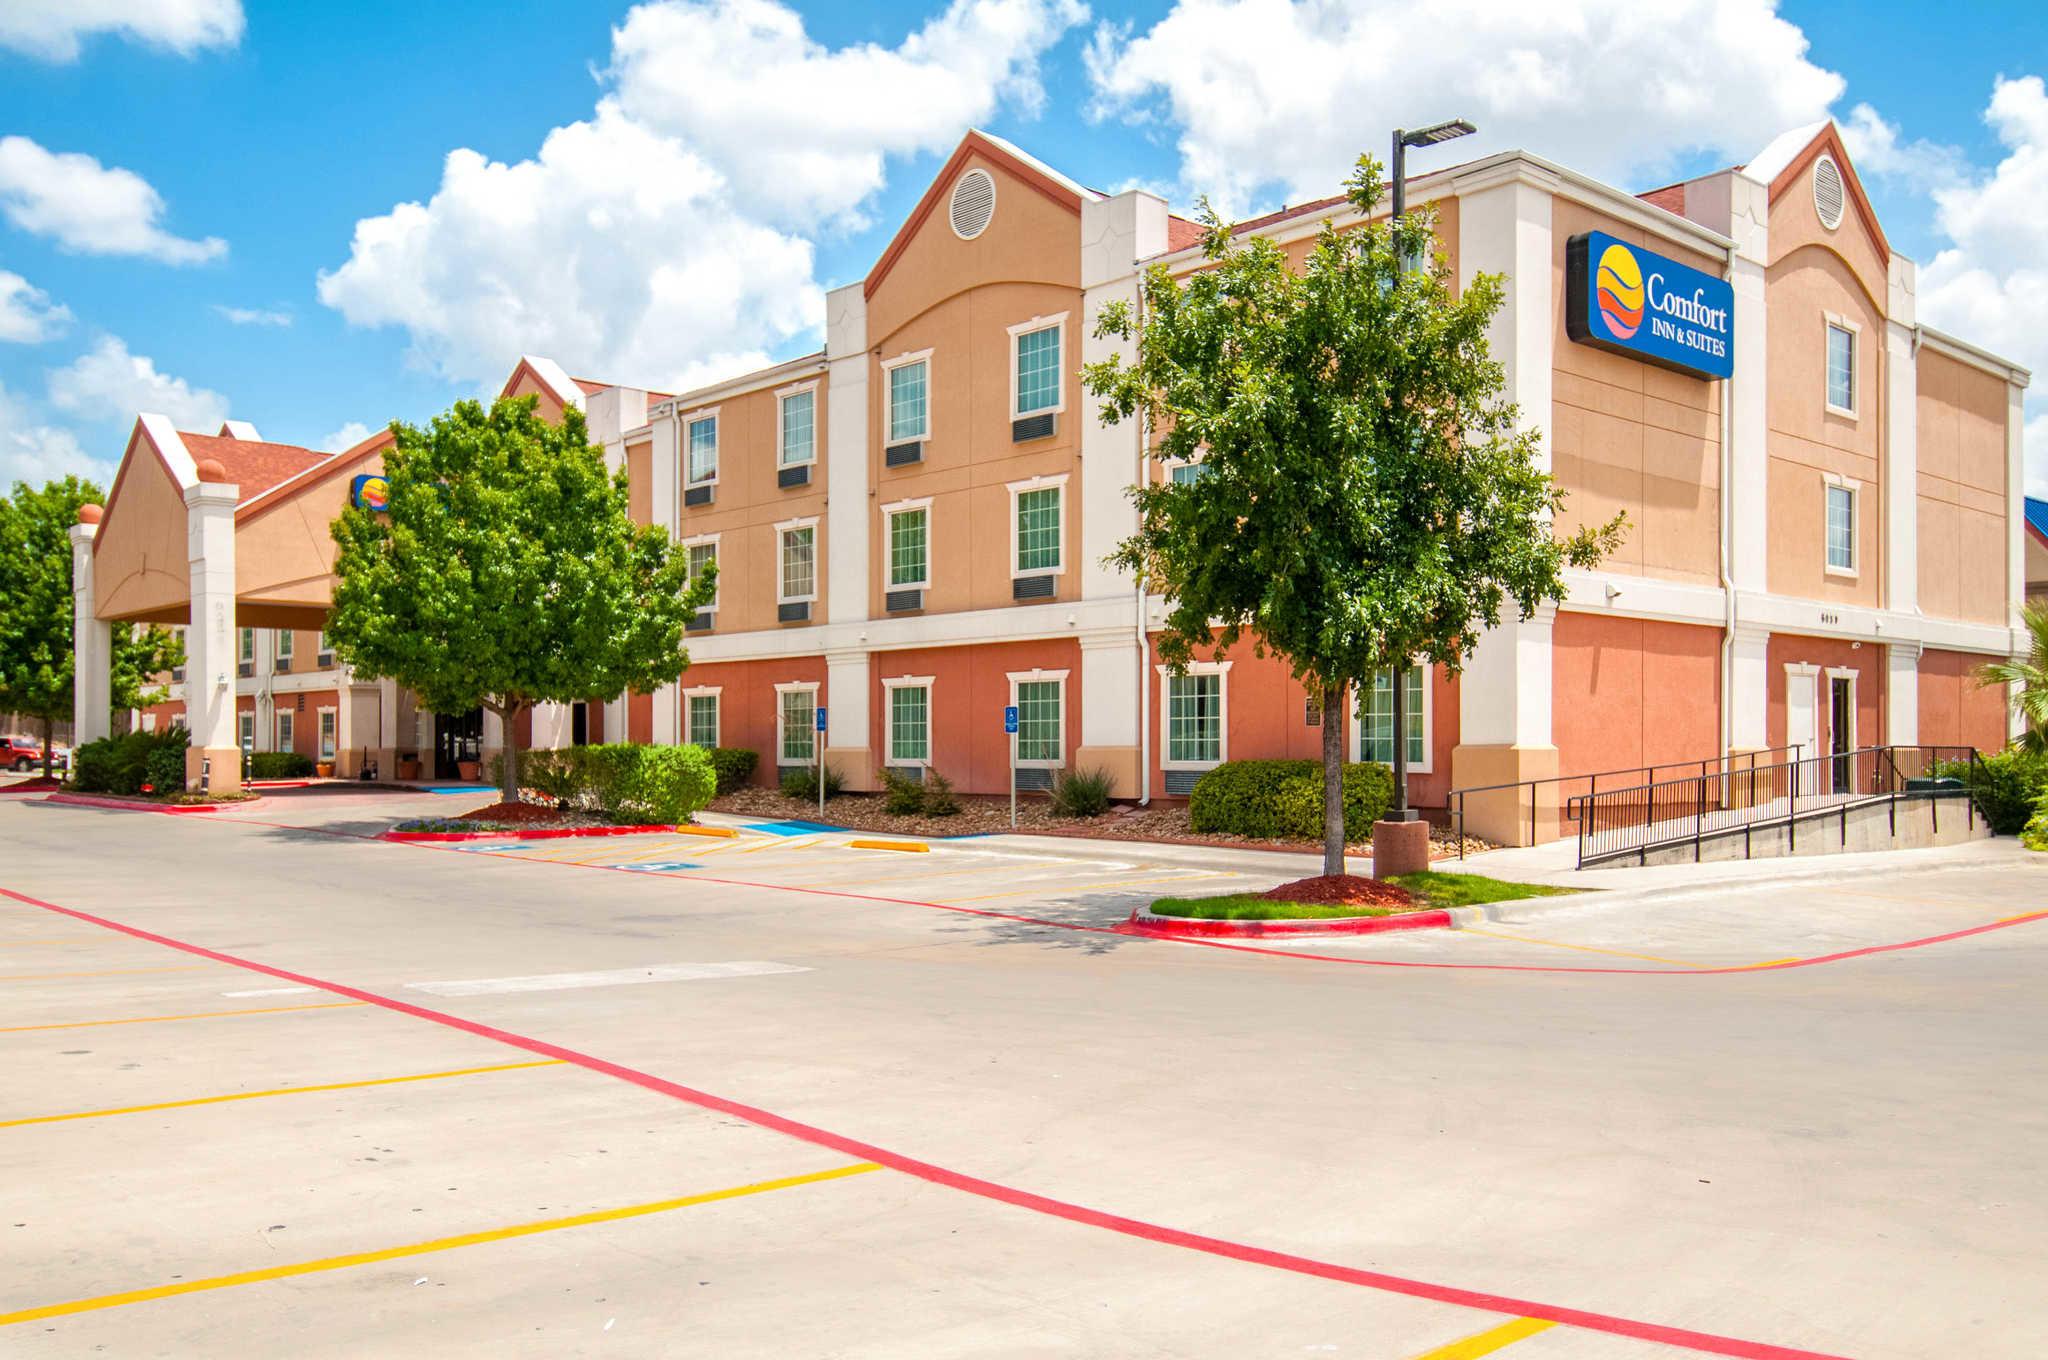 Comfort Inn & Suites Near Medical Center image 1